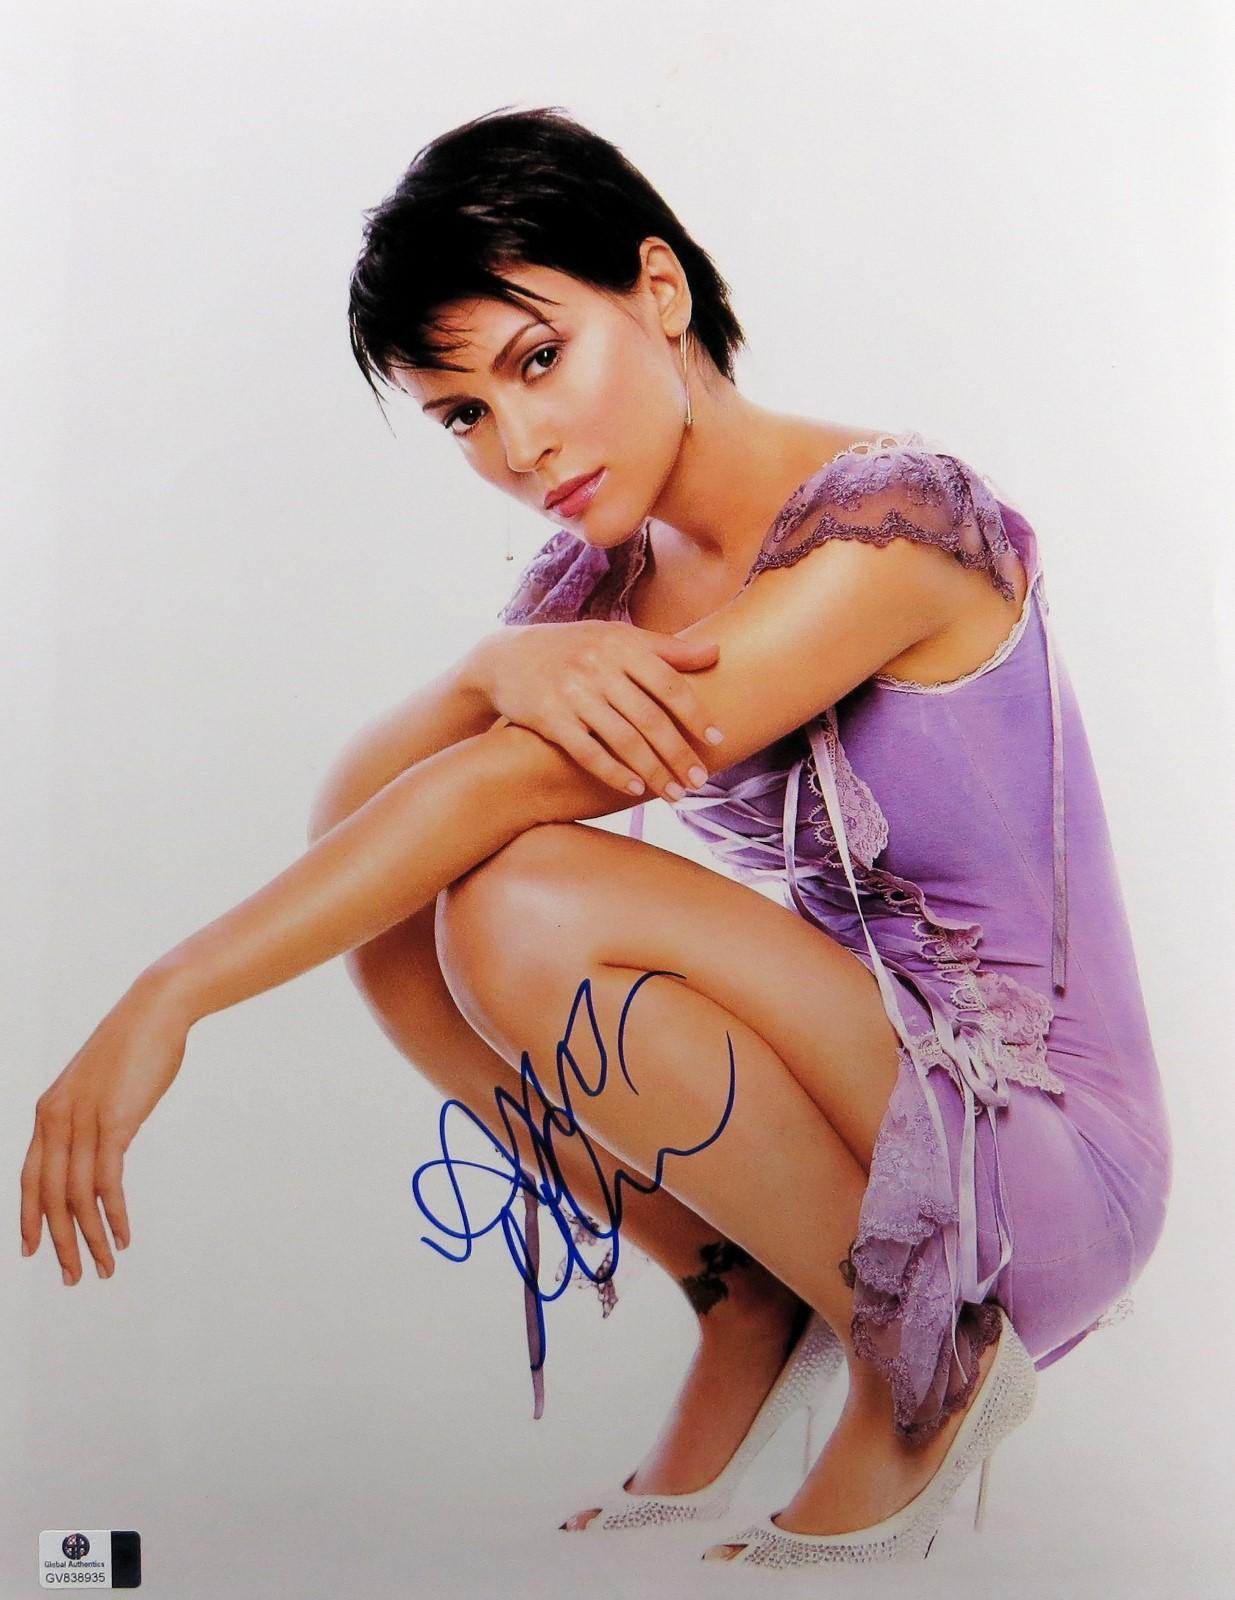 alyssa milano signed autographed 11x14 photo gorgeoue sexy short hair gv838935